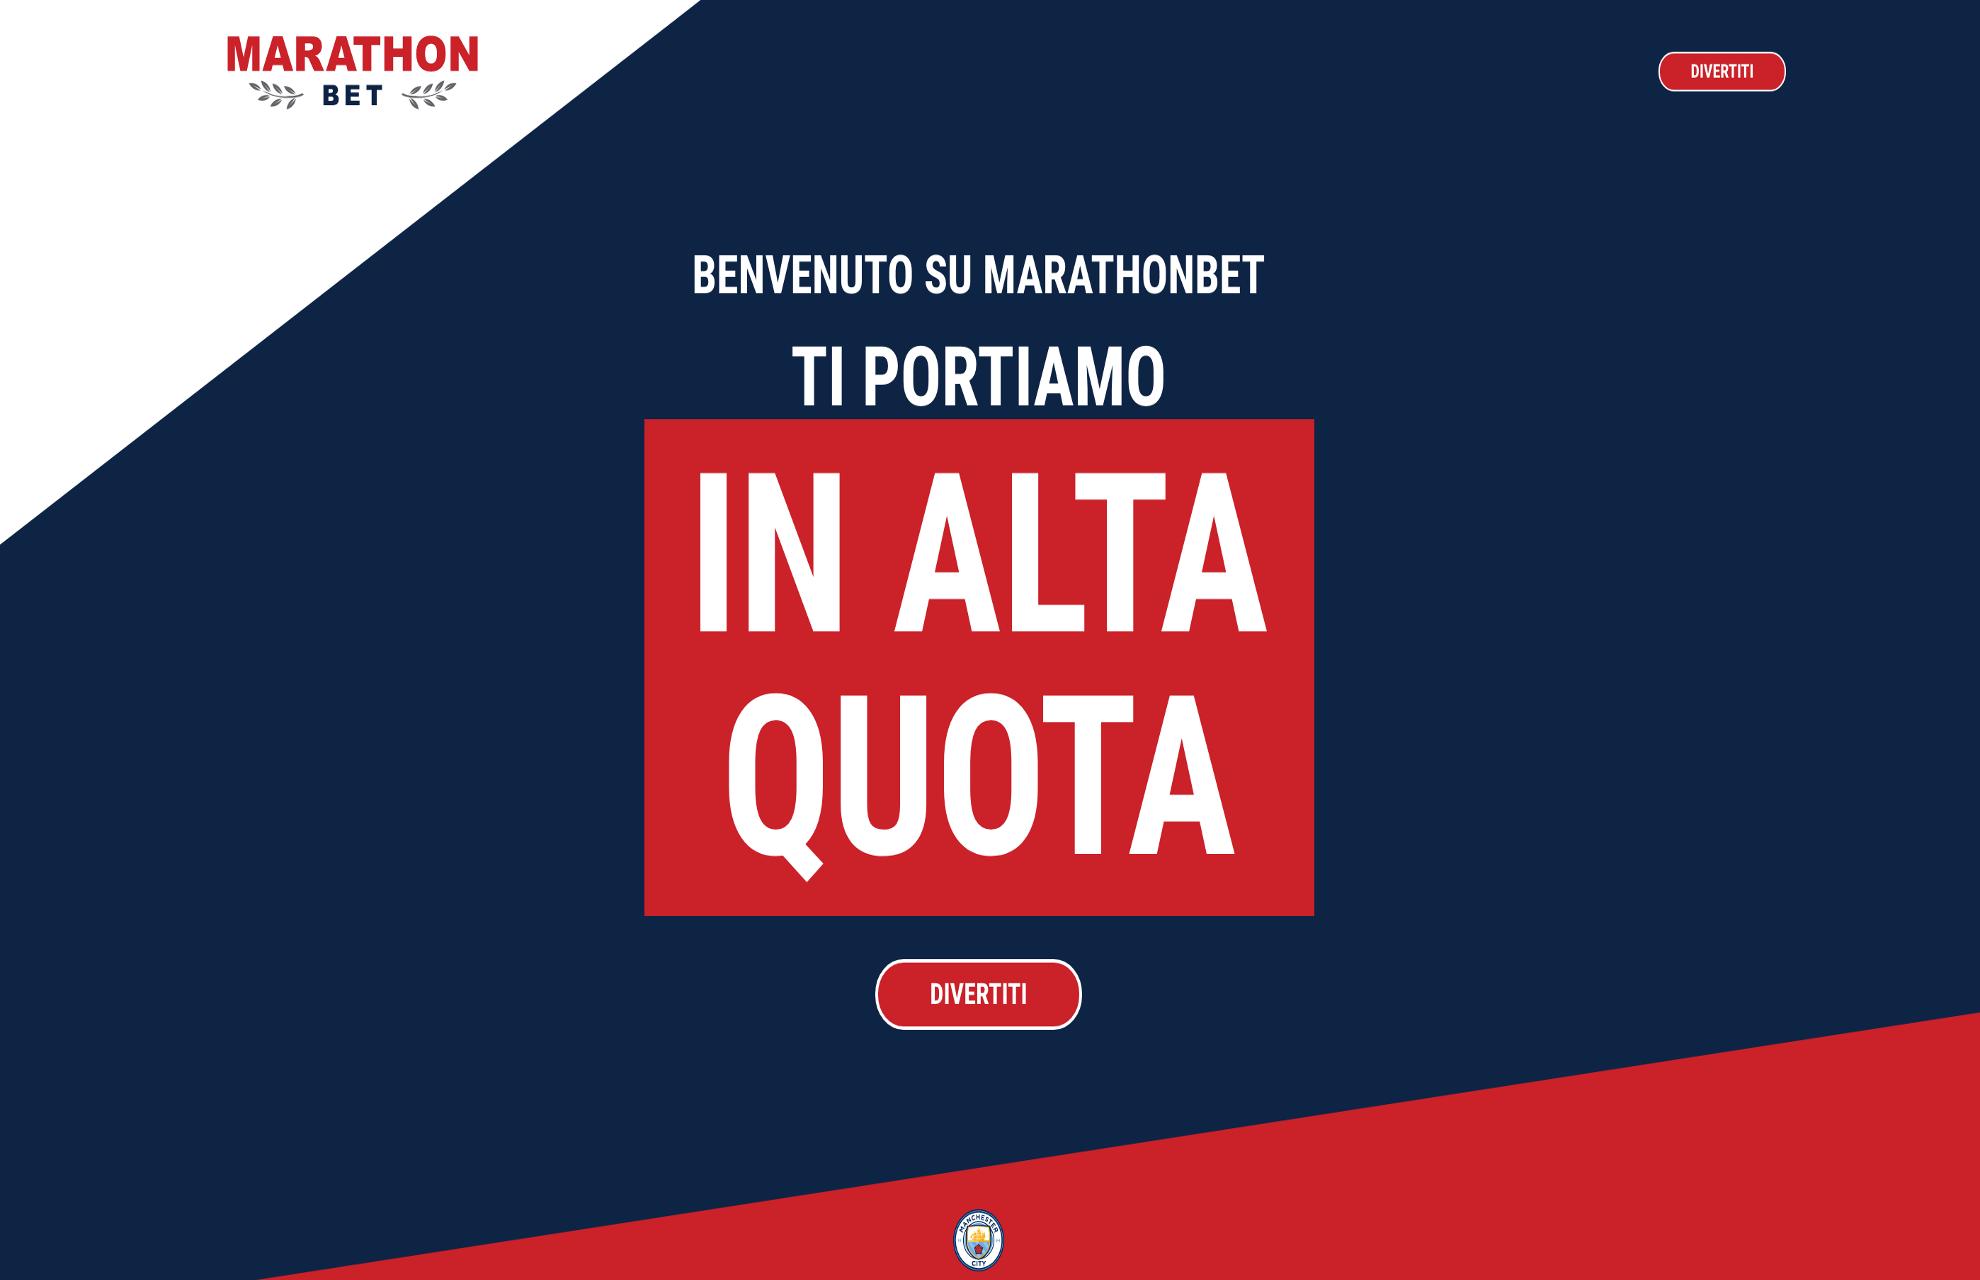 marathonbet sito scommesse aams